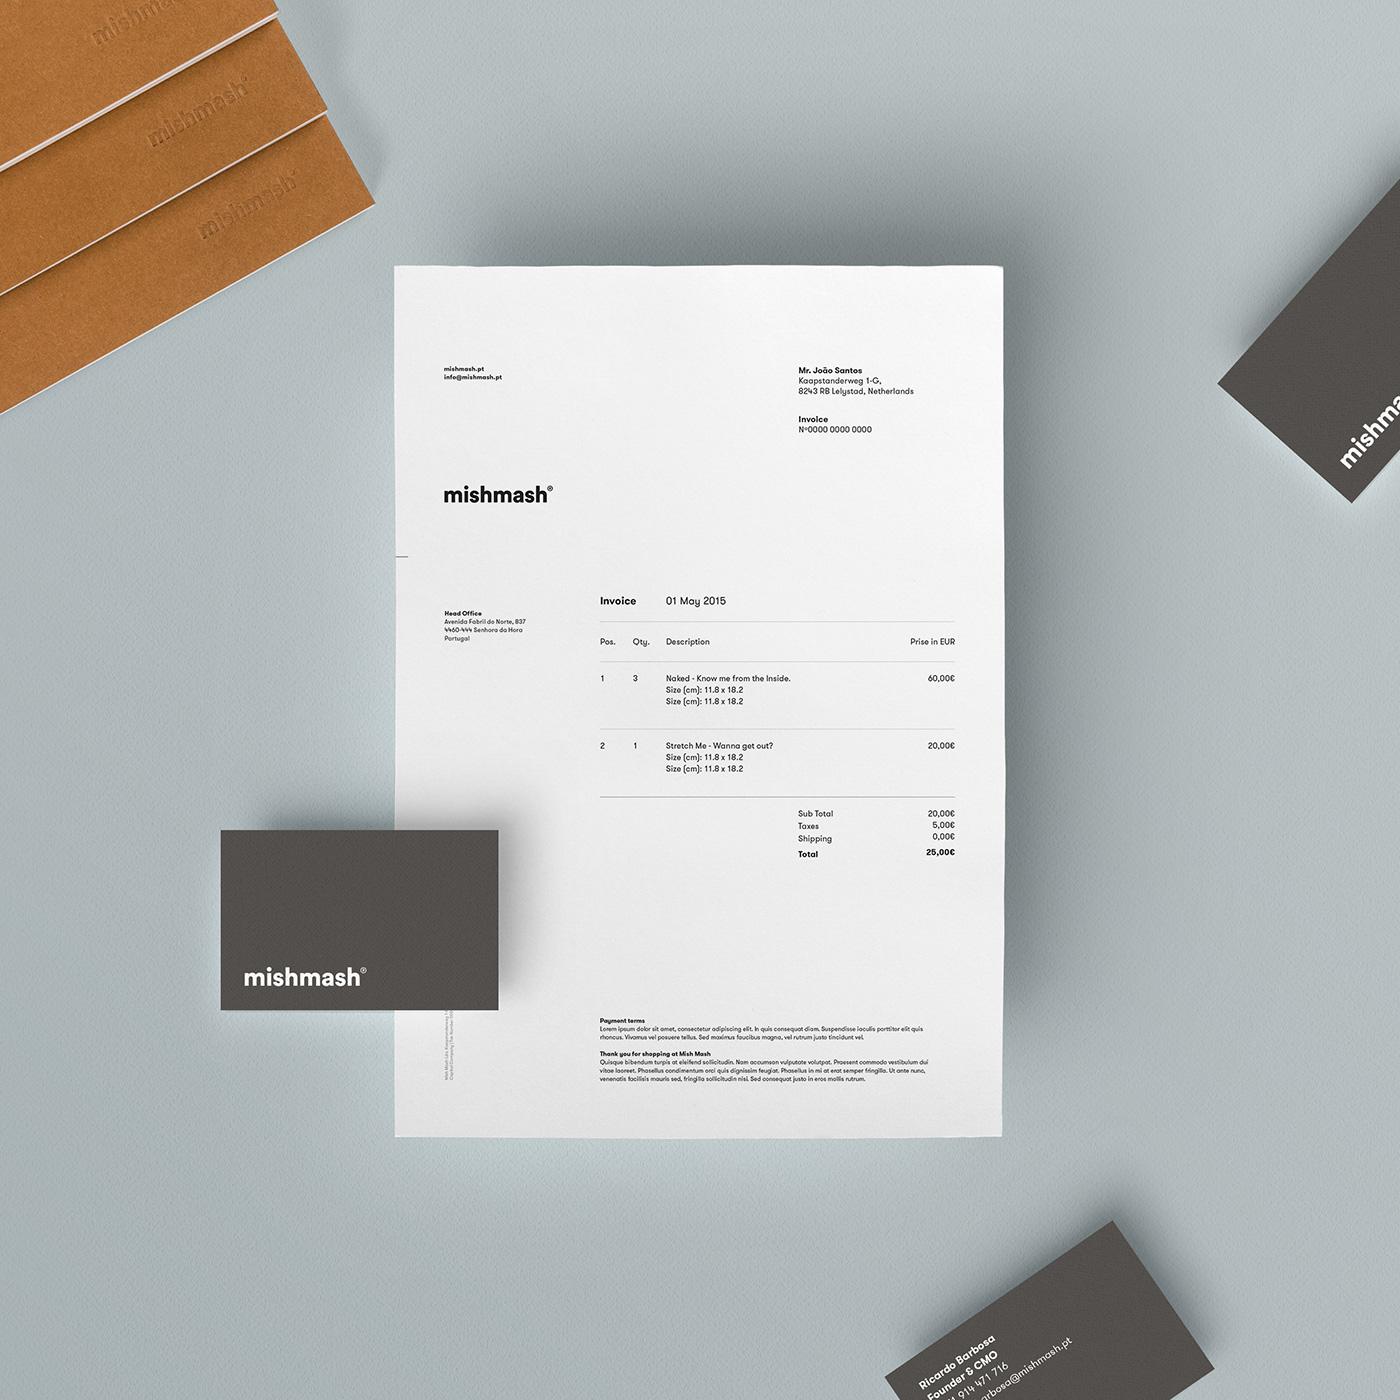 mishmash design notebook Stationery Office supplies school scrapbooking desk Minimalism graphic creative idea